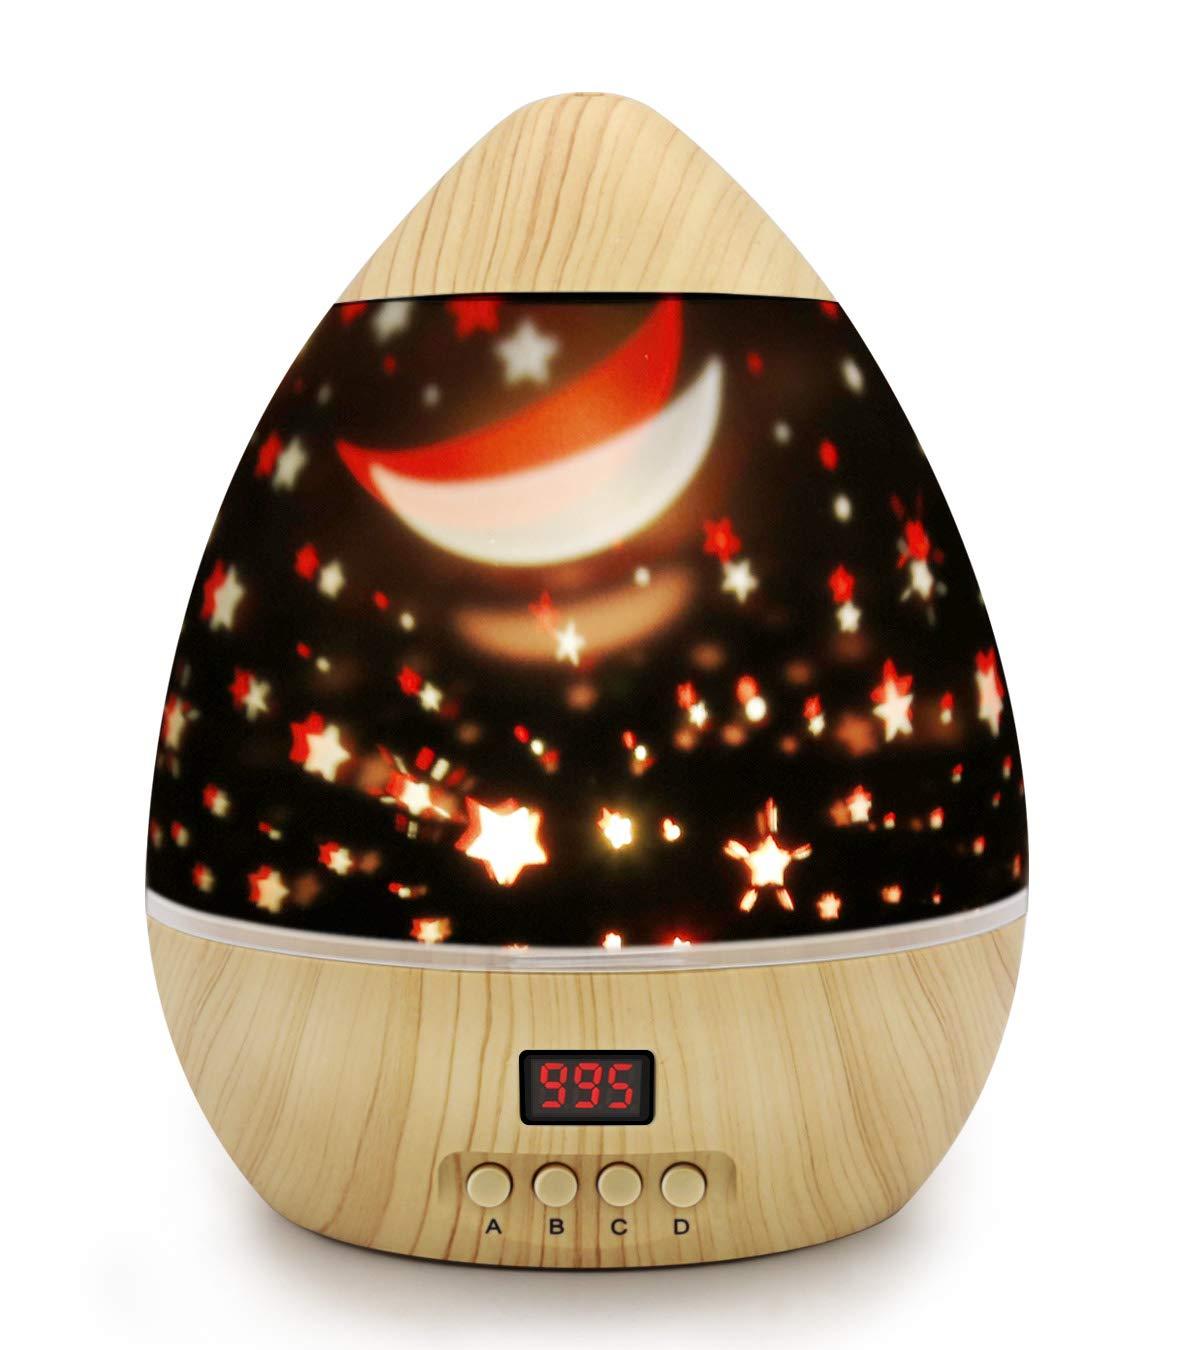 Timer Night Lamp,DSAATN 360 Rotating Star Moon Sky Projector, Romantic Home Decoration Lamp Christmas Gift for Children (